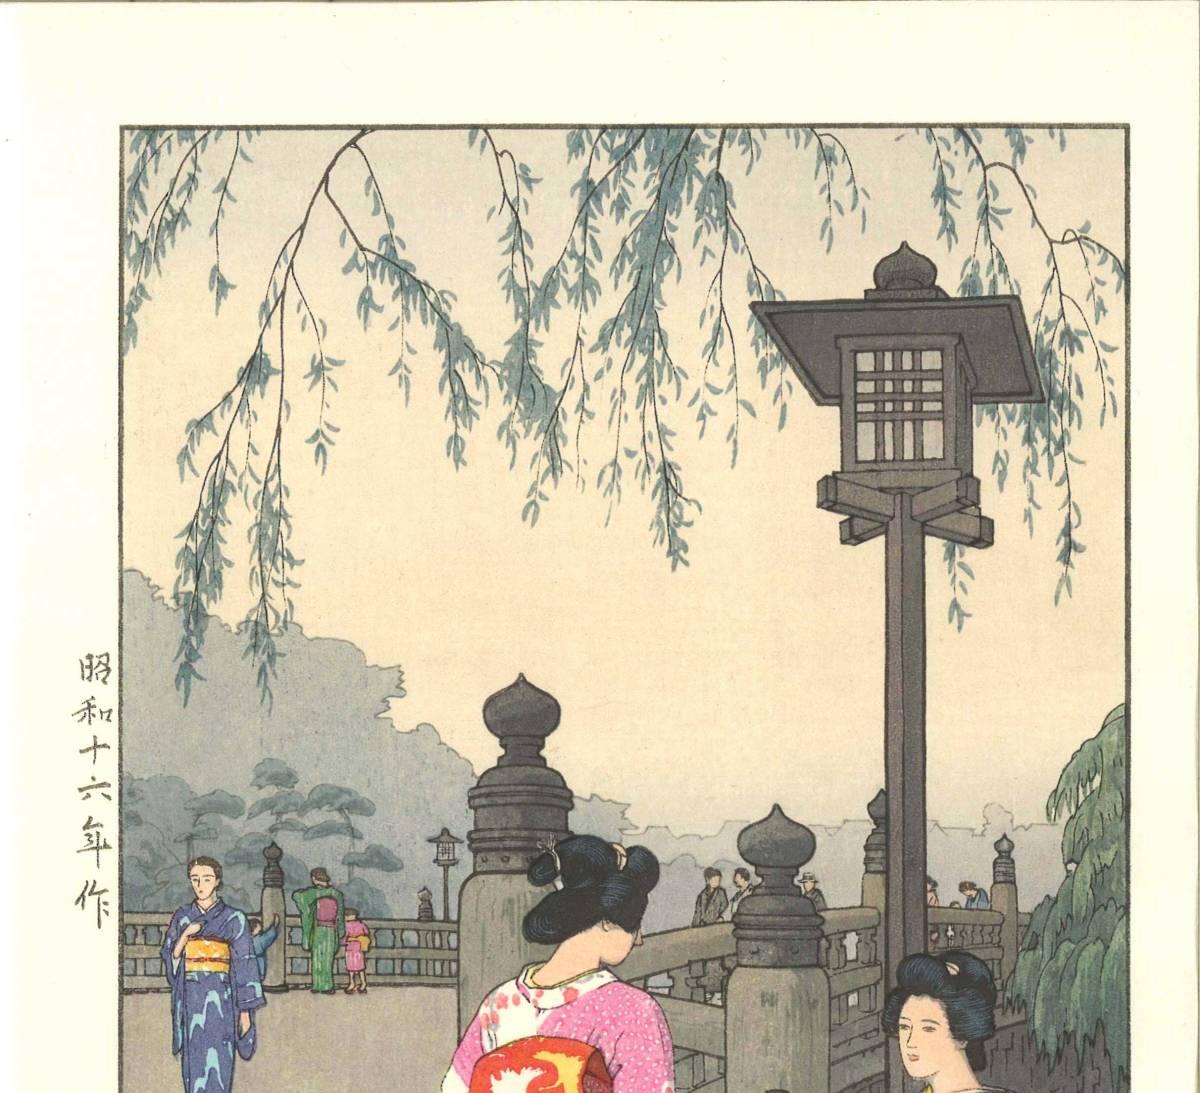 吉田遠志 木版画  014103 弁慶橋 (Benkei Bridge)  初摺1941年    最高峰の摺師の技をご堪能下さい!!_画像2